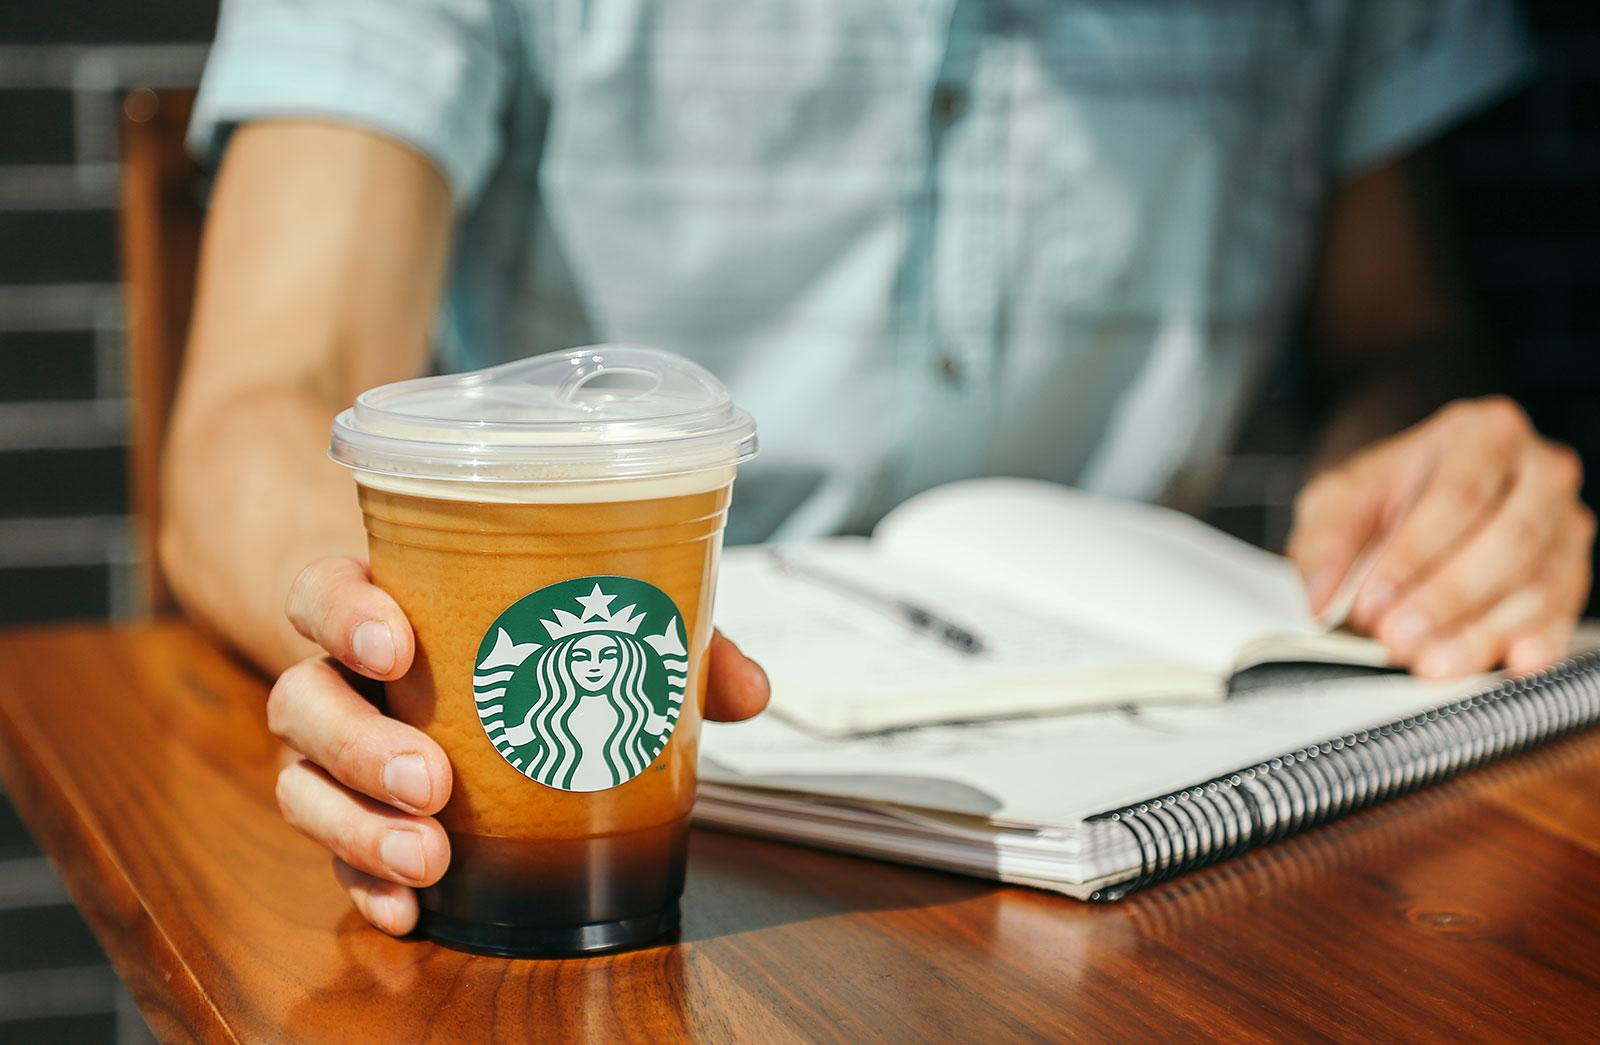 Starbucks debuted its strawless lid in 2018. (Starbucks)